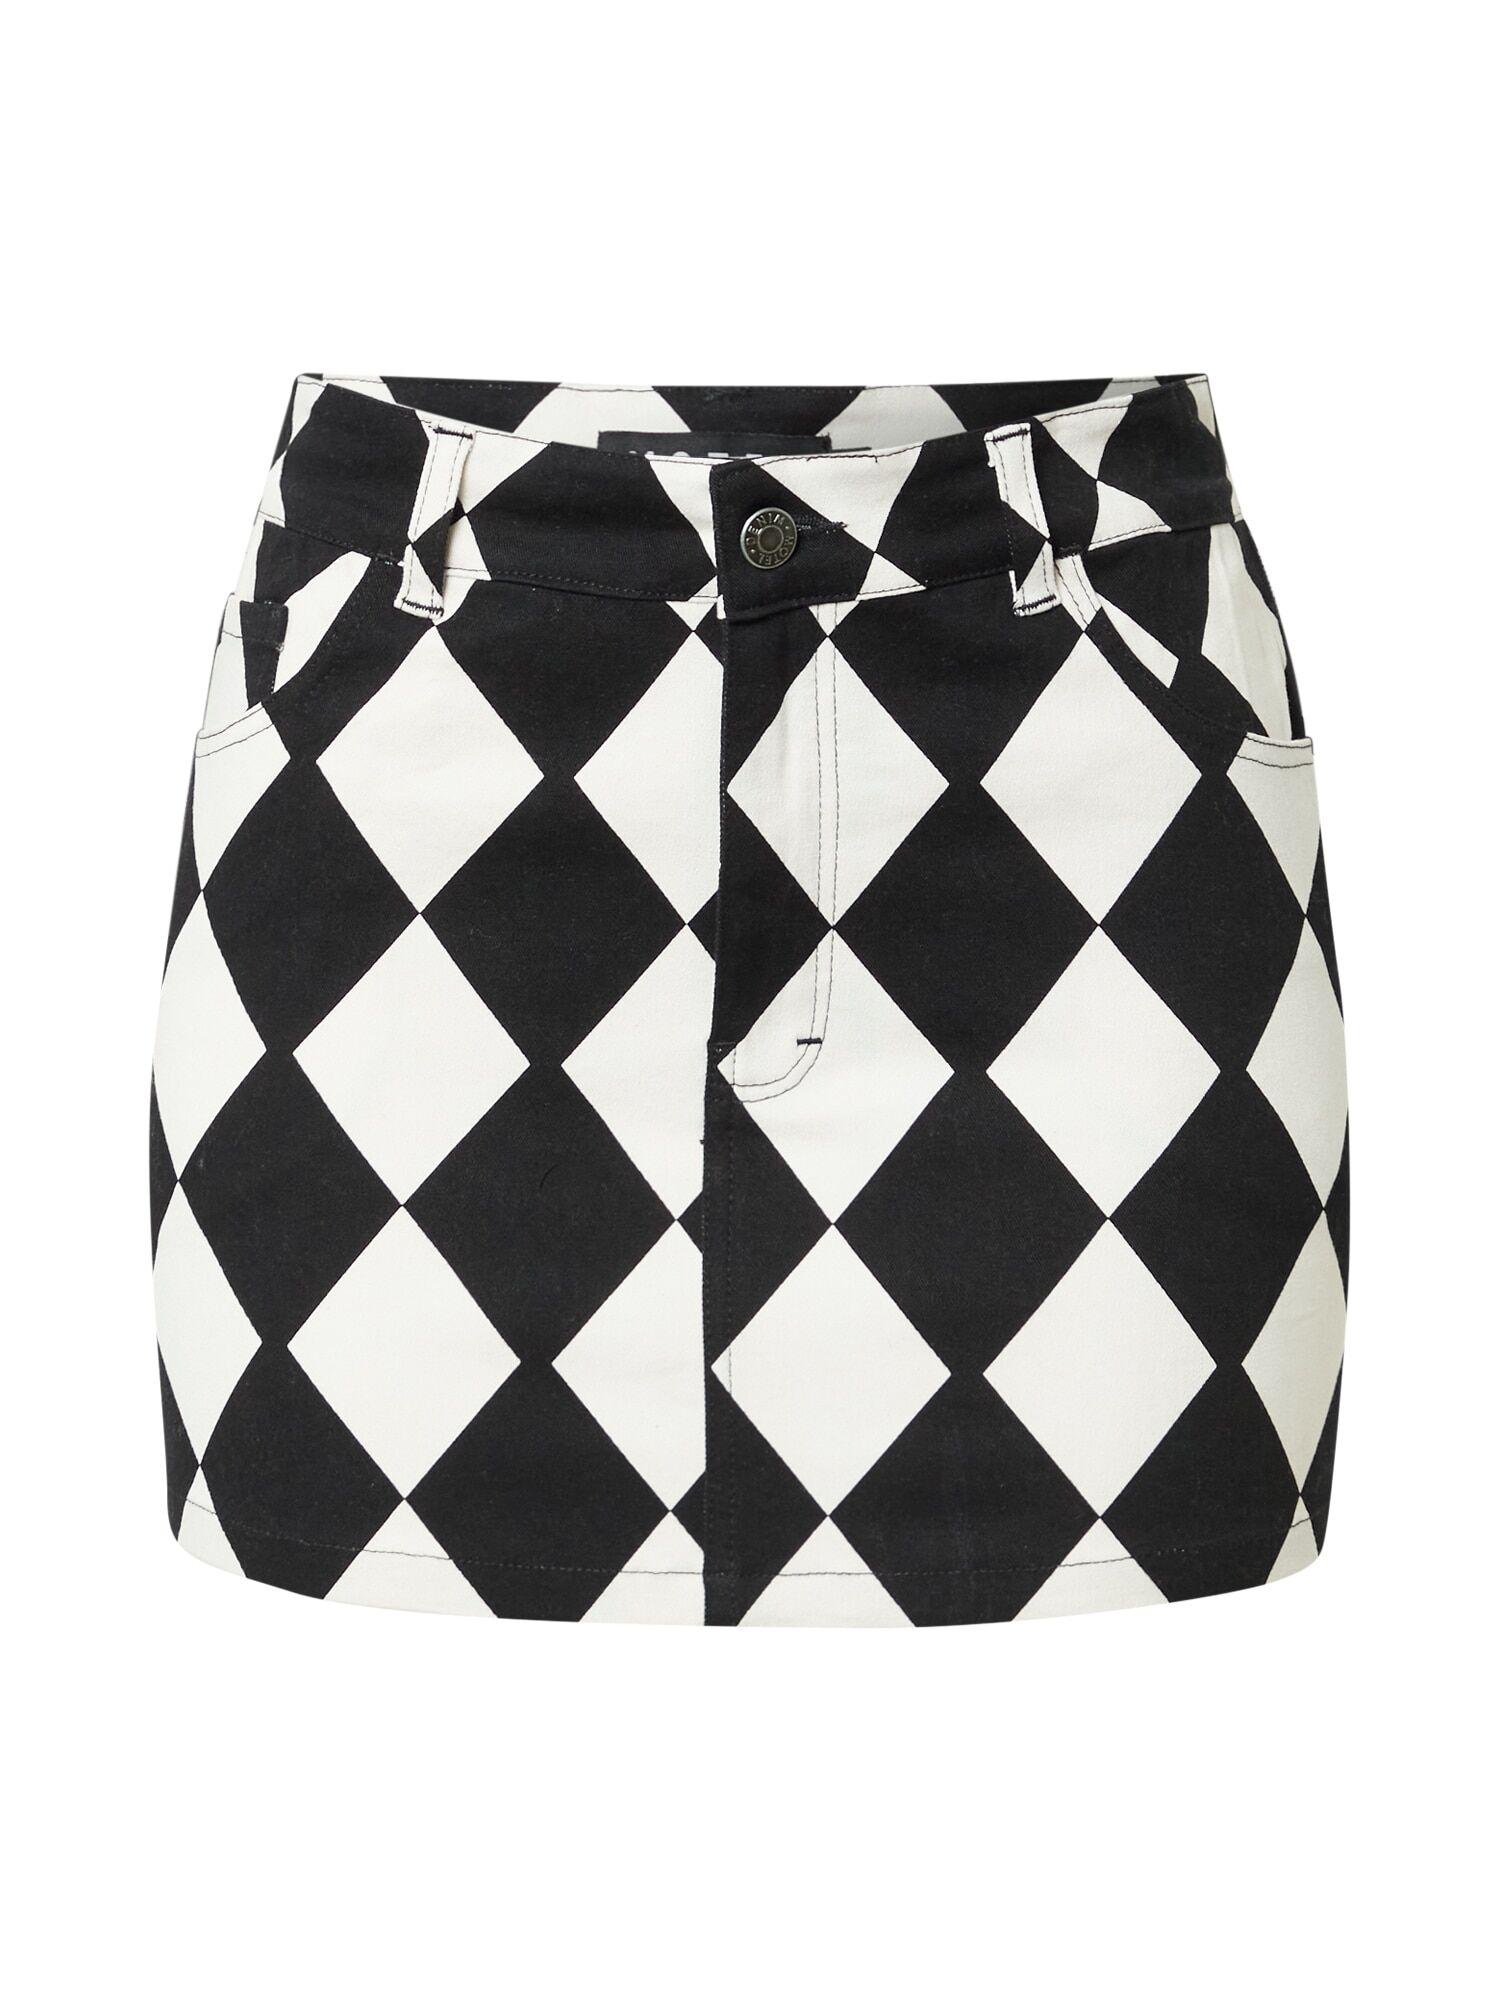 Motel Jupe 'Micro Broomy'  - Noir, Blanc - Taille: XS - female